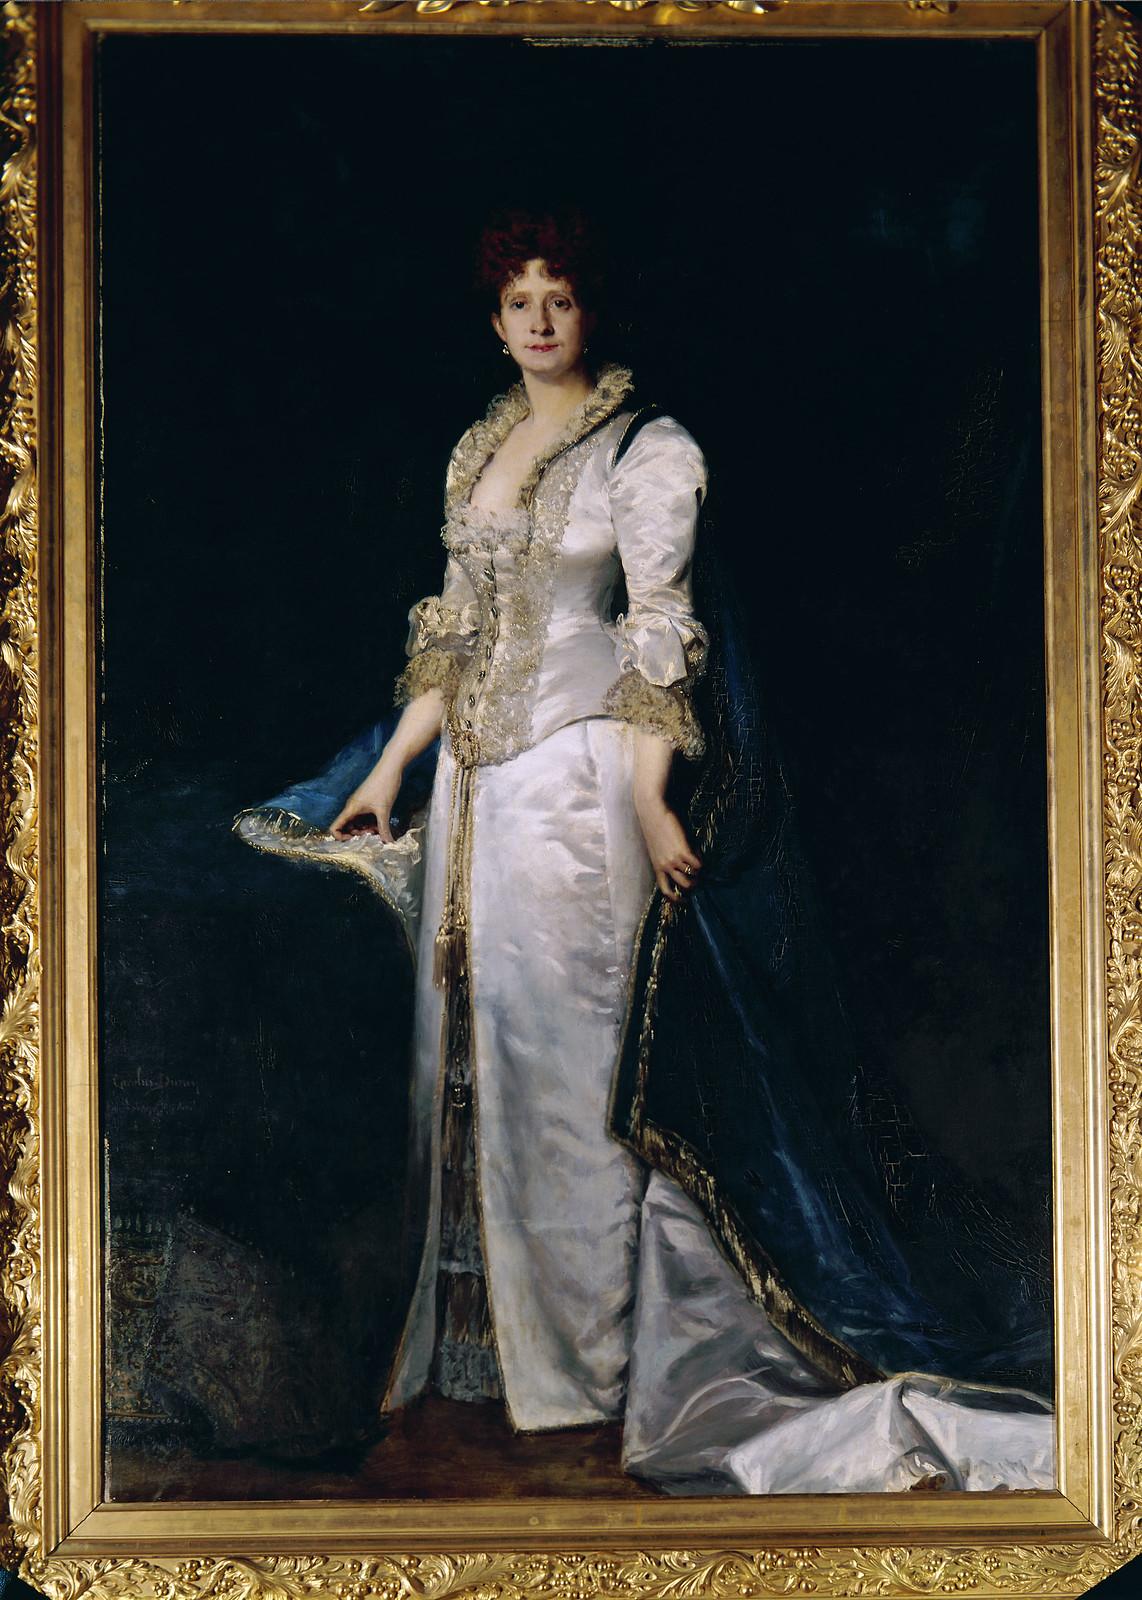 D. Maria Pia, por Carlos Duran, 1880 (Fotografia de M. Novais, 1933-83)